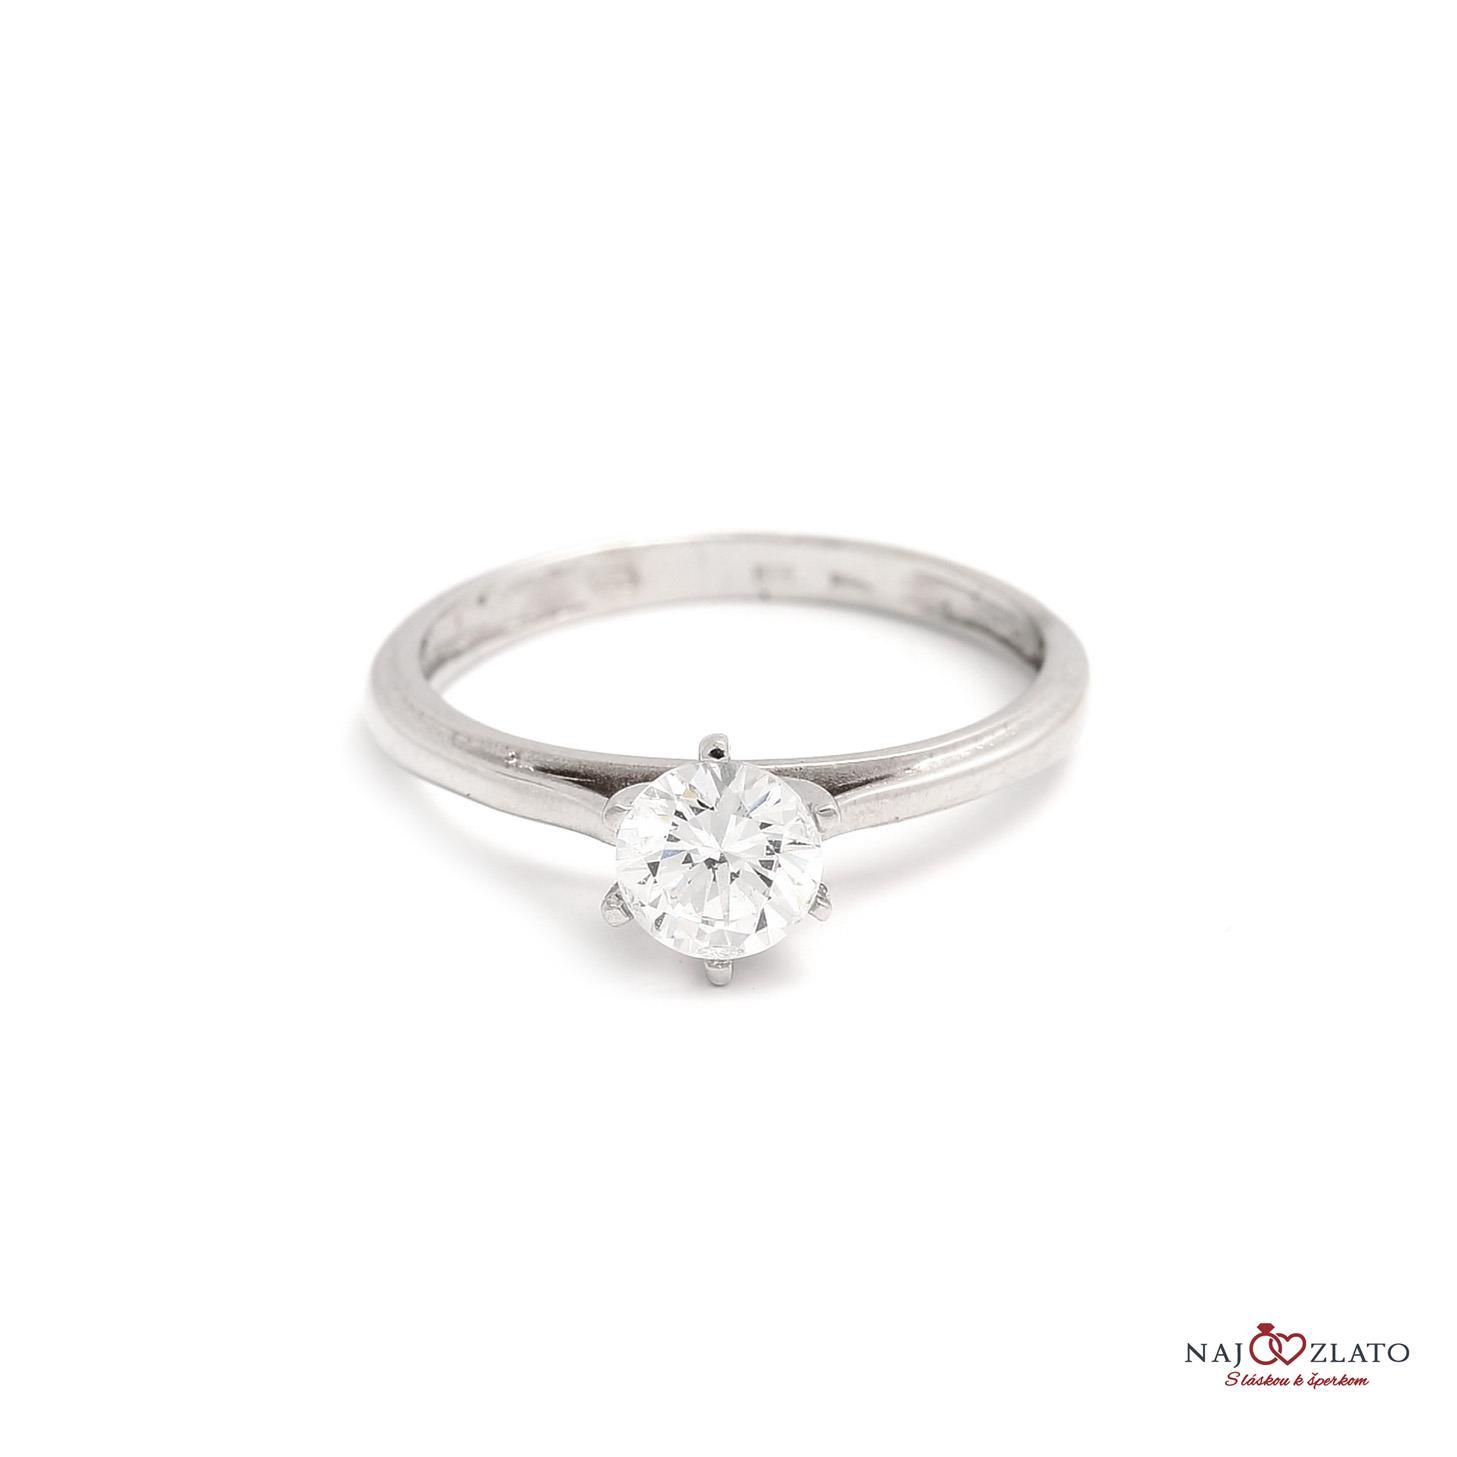 zlatý zásnubný prsteň clematis white zlatý zásnubný prsteň clematis white 1  ... 7b34e8cf8ad